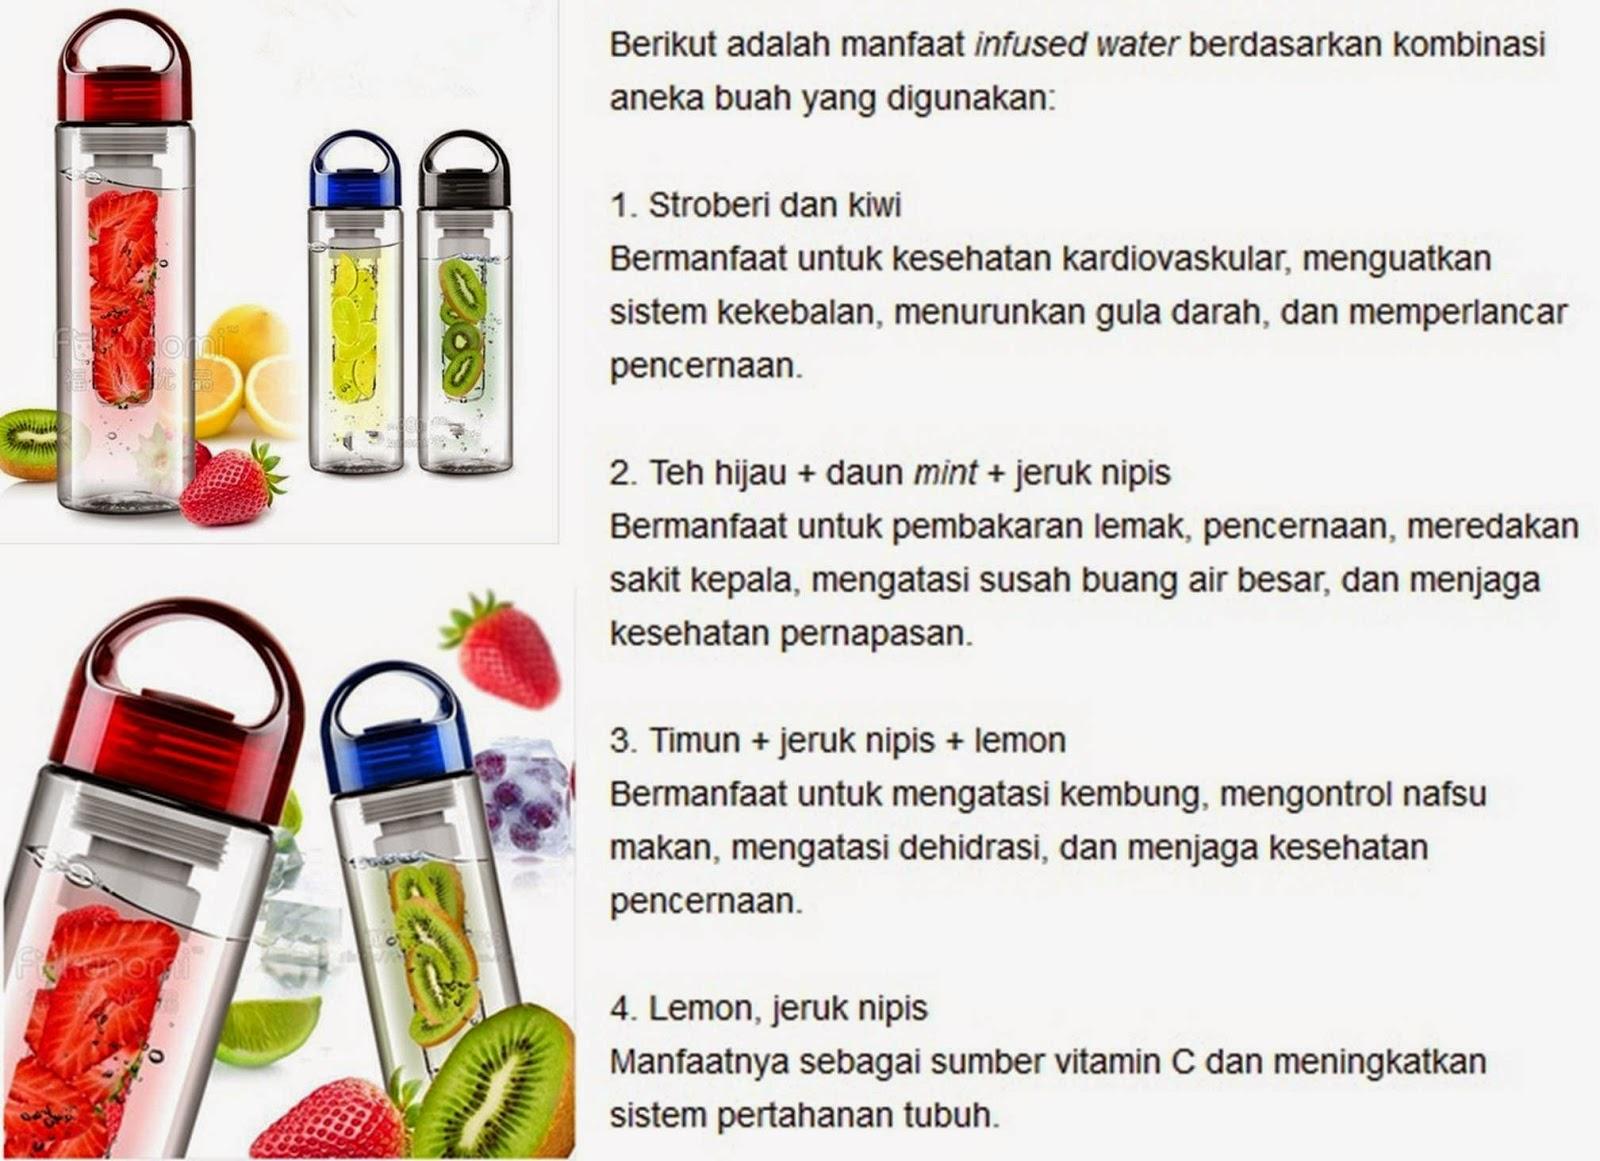 Tritan Bottle 3rd Generation Gen 3 Infused Fruit Water Bpa Free Botol Air Minum Infuse Citrus 2nd Sporty Infuser Generasi 2 Bukan Merk Tupperware Tulipware